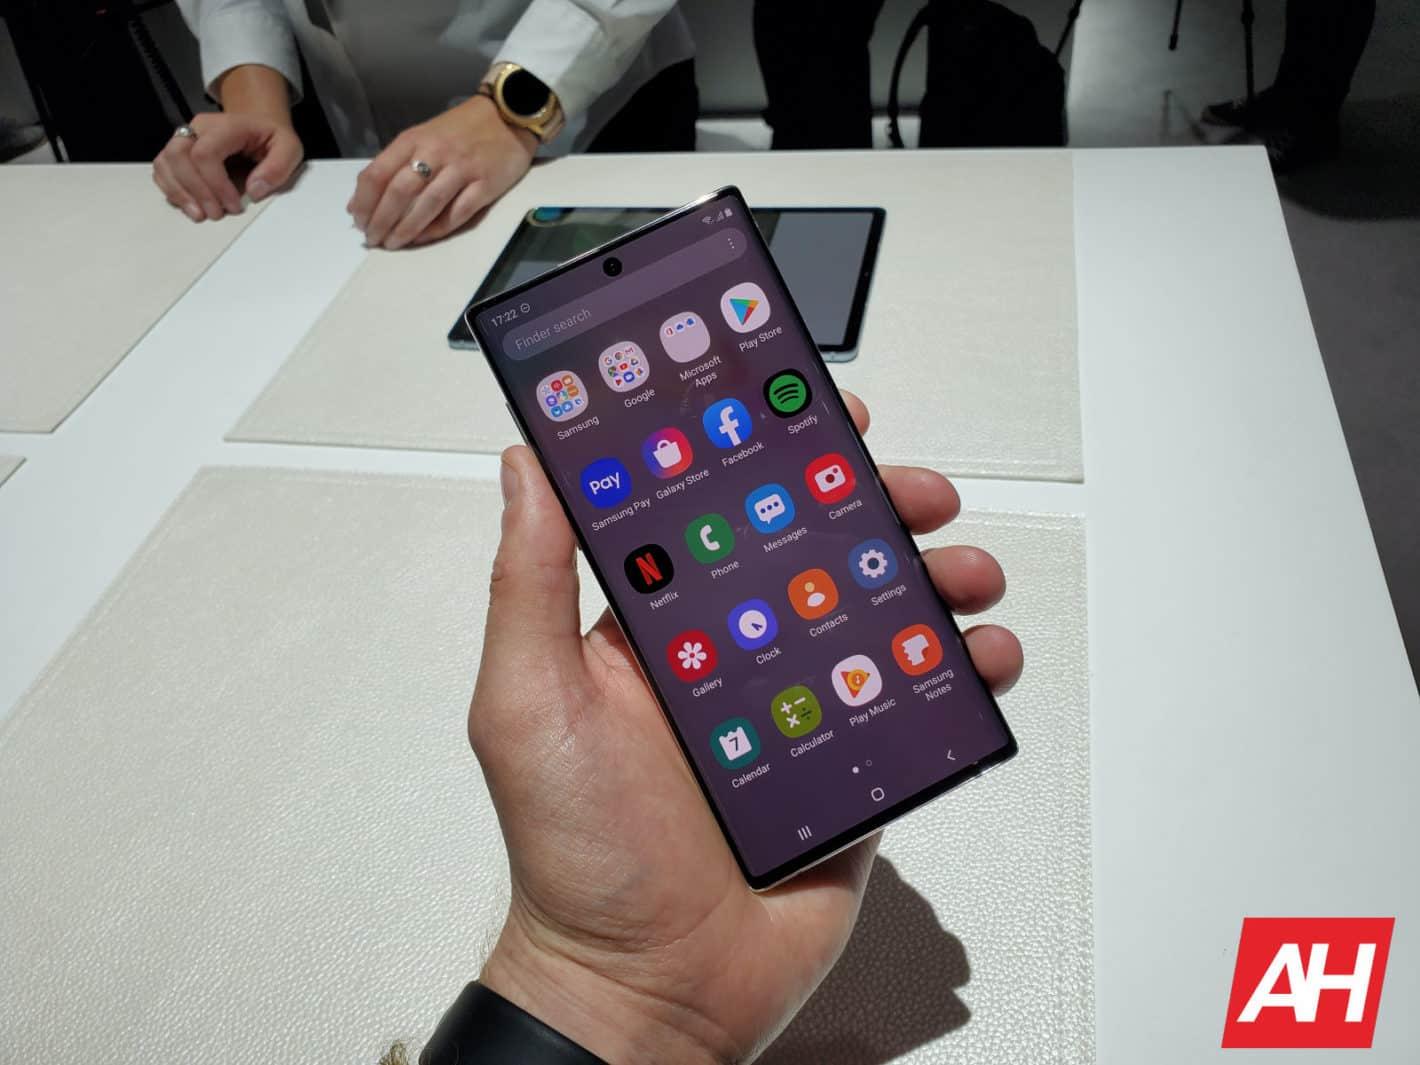 Samsung Galaxy Note 10 AH 2019 17